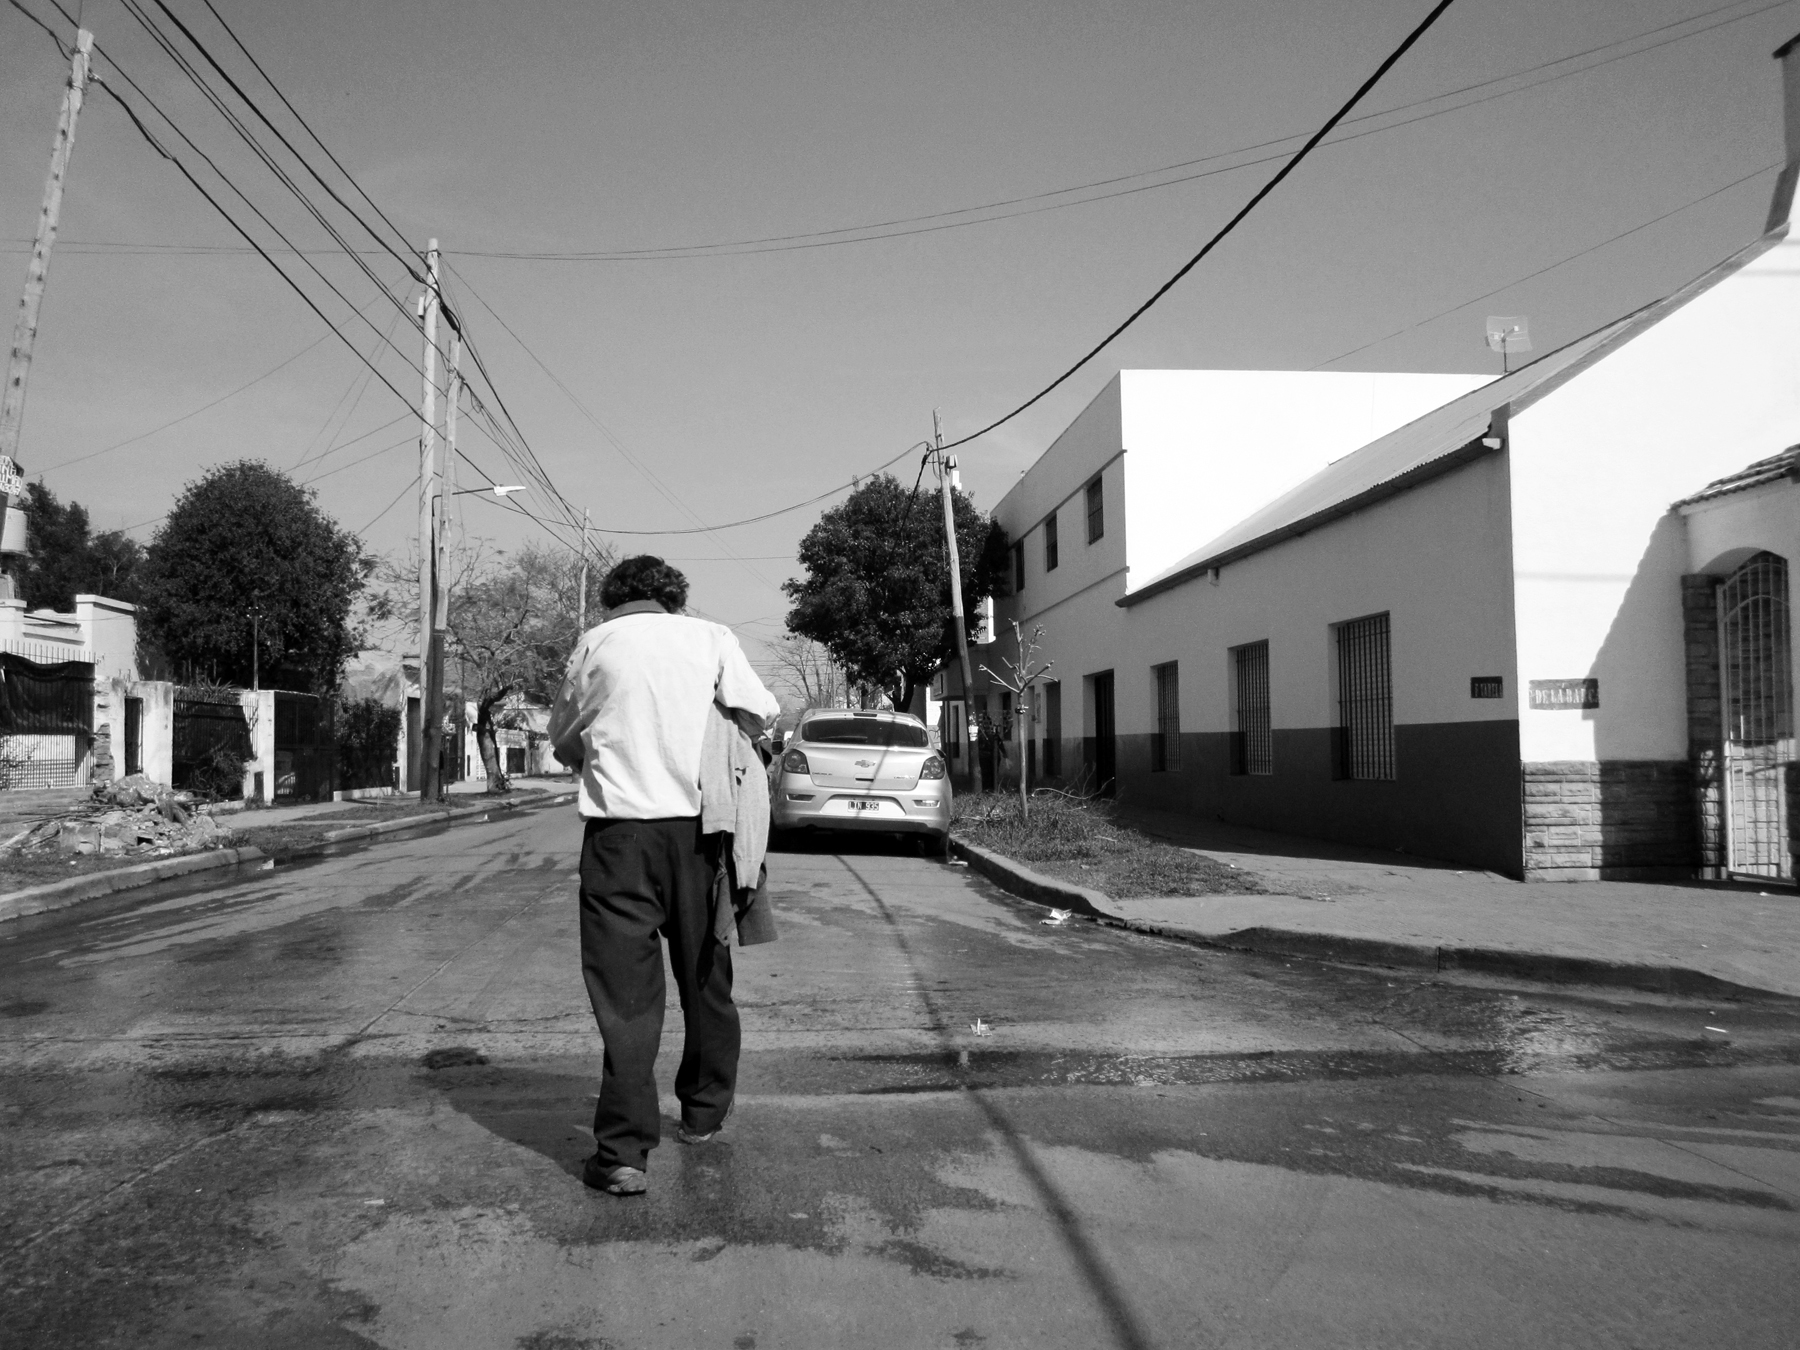 Calles del conurbano